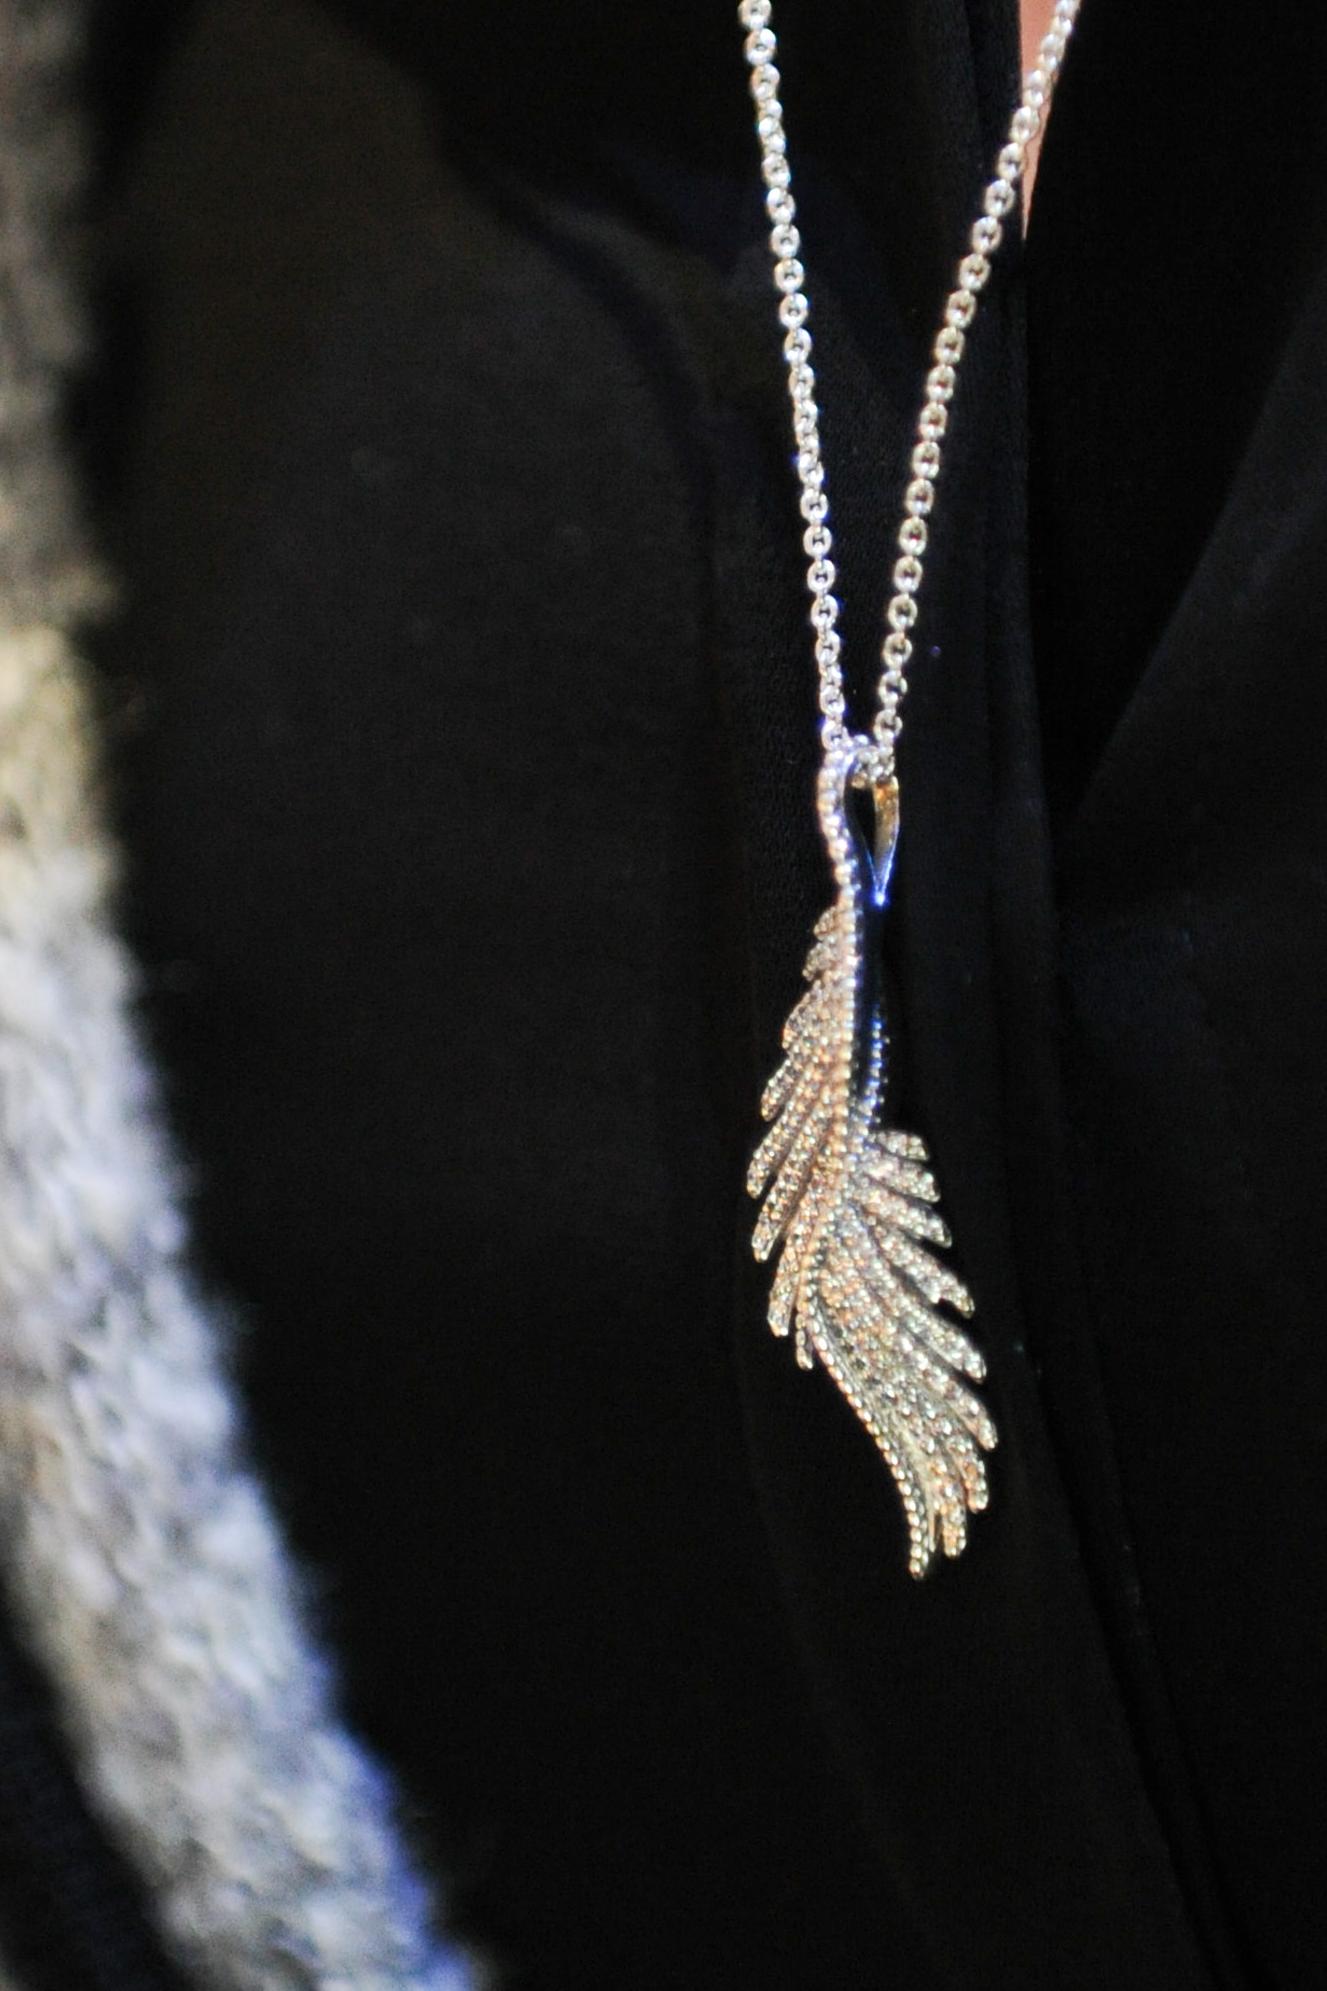 acff9a8ba Janette Ewen with the stunning PANDORA phoenix feather necklace.  #PANDORAatWMCFW #PANDORAsponsors